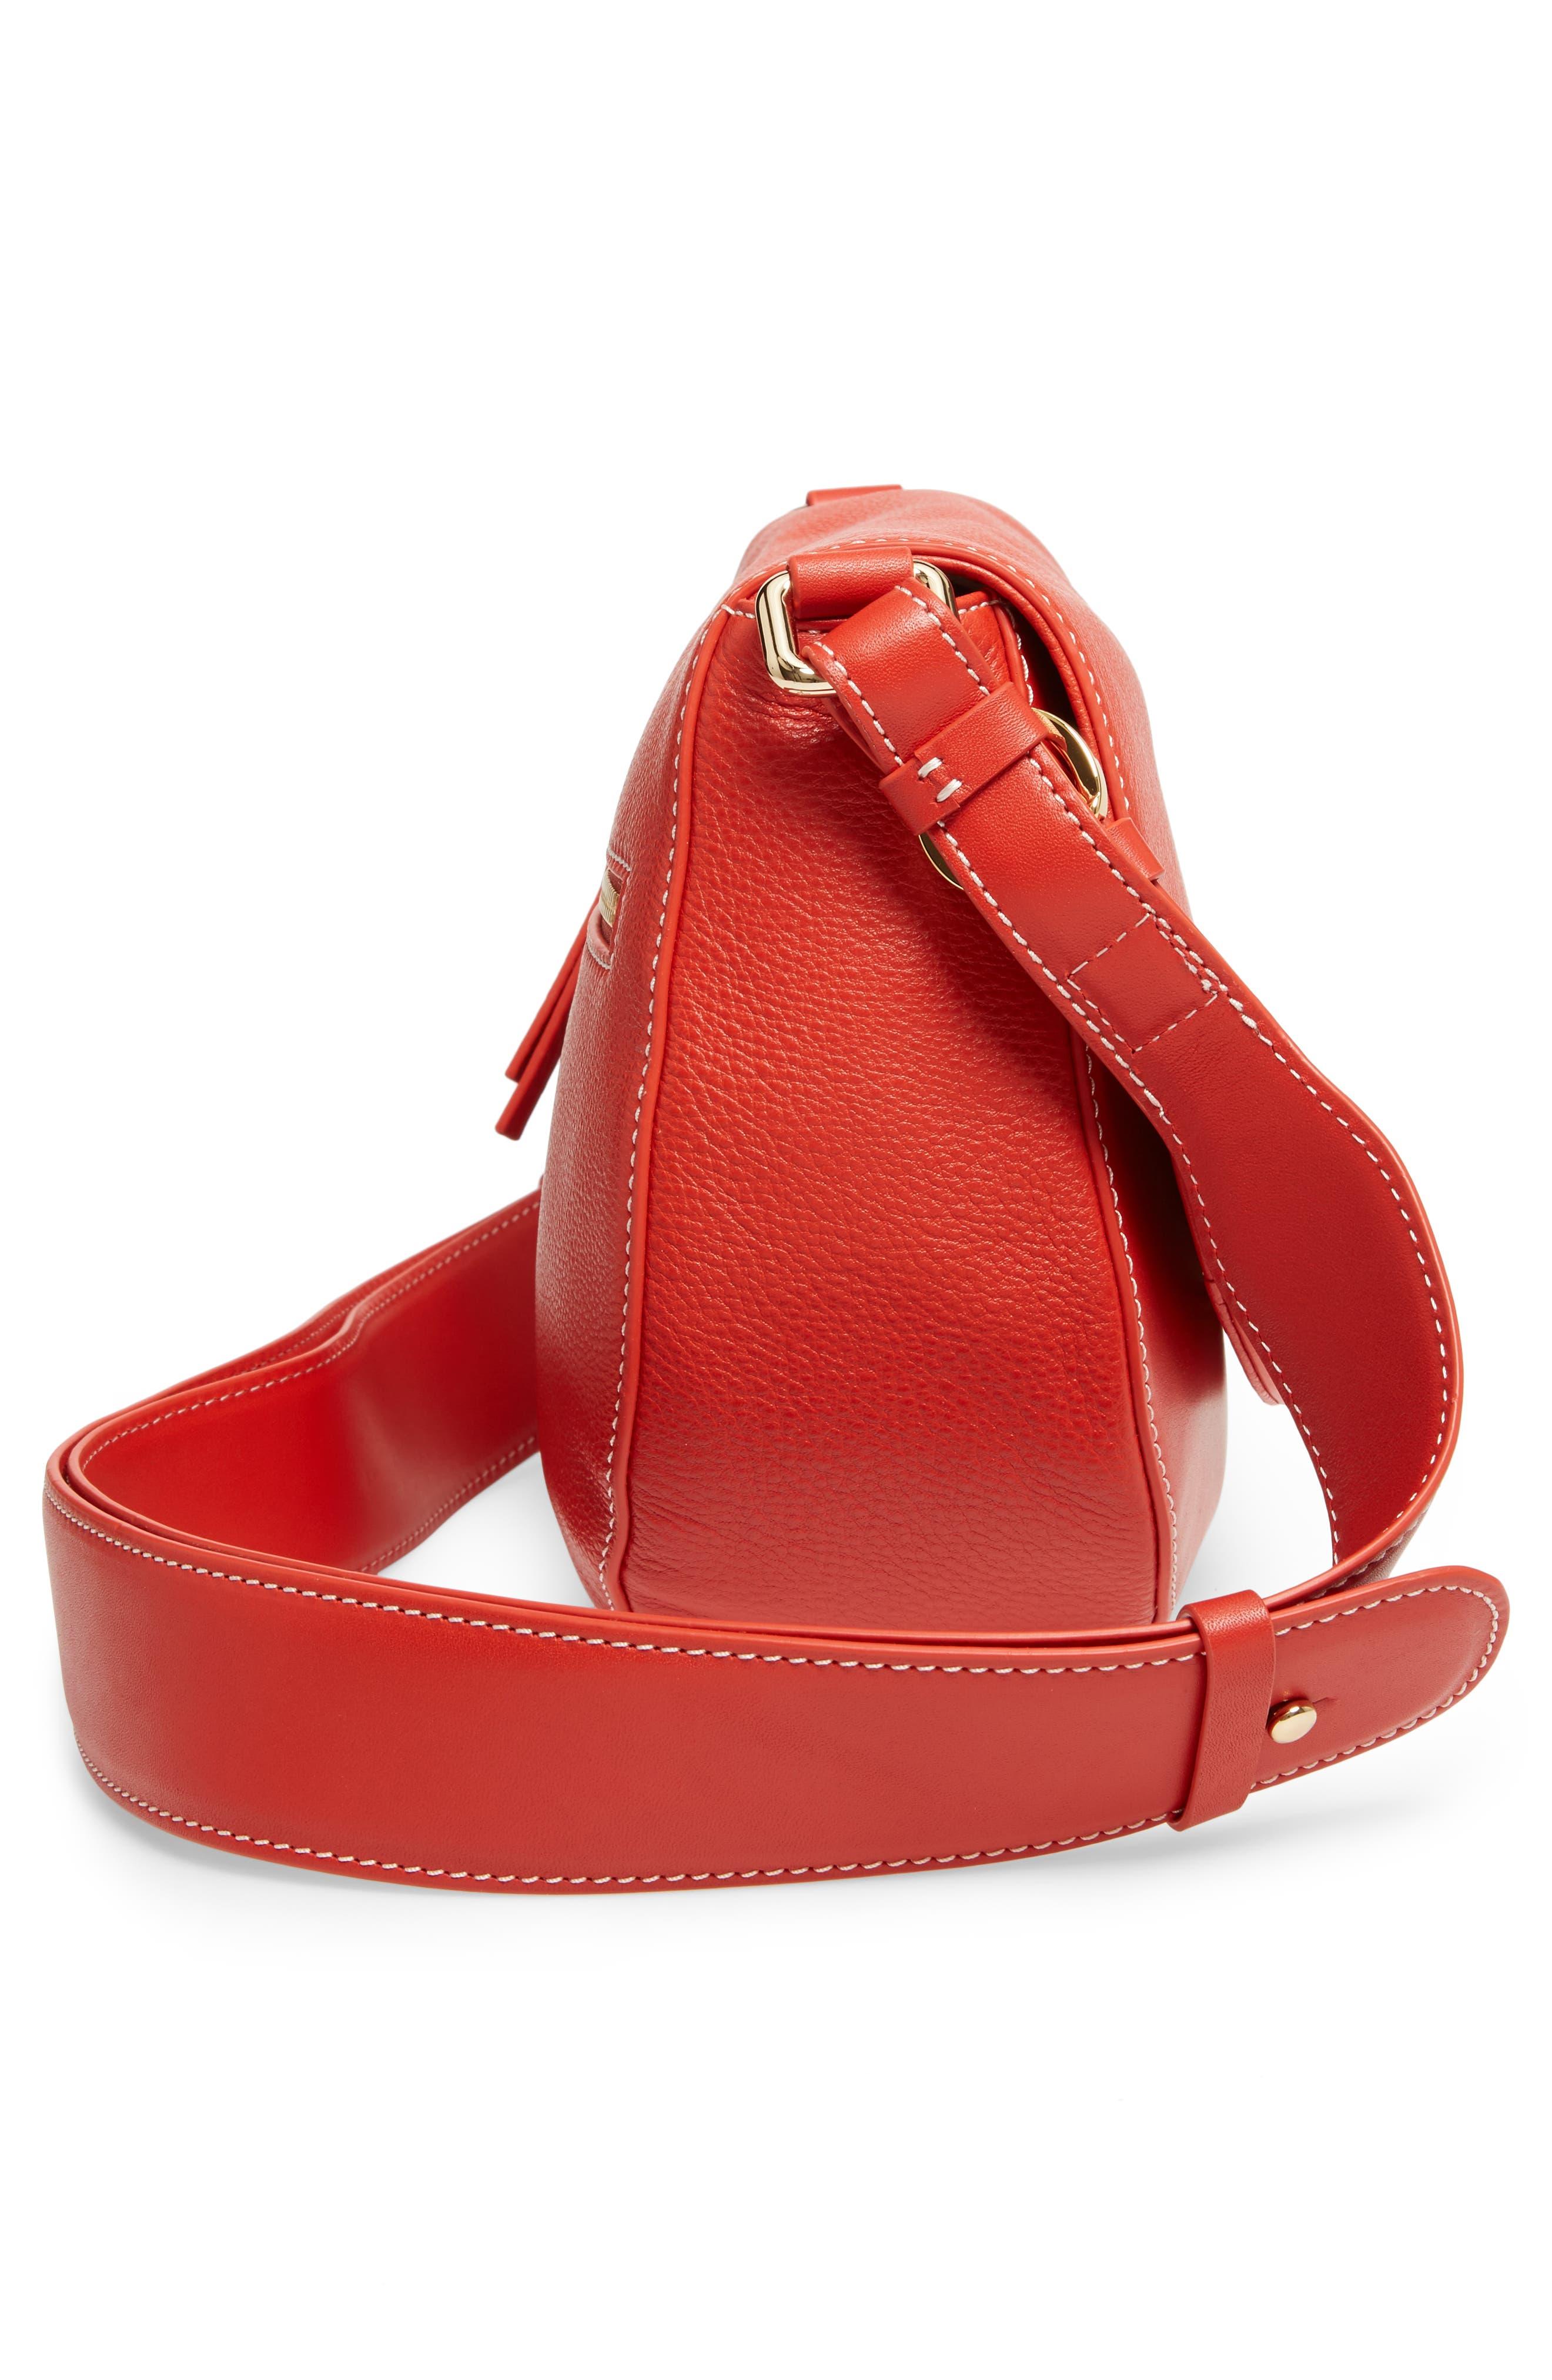 Small Ellen Leather Crossbody Bag,                             Alternate thumbnail 5, color,                             Coral